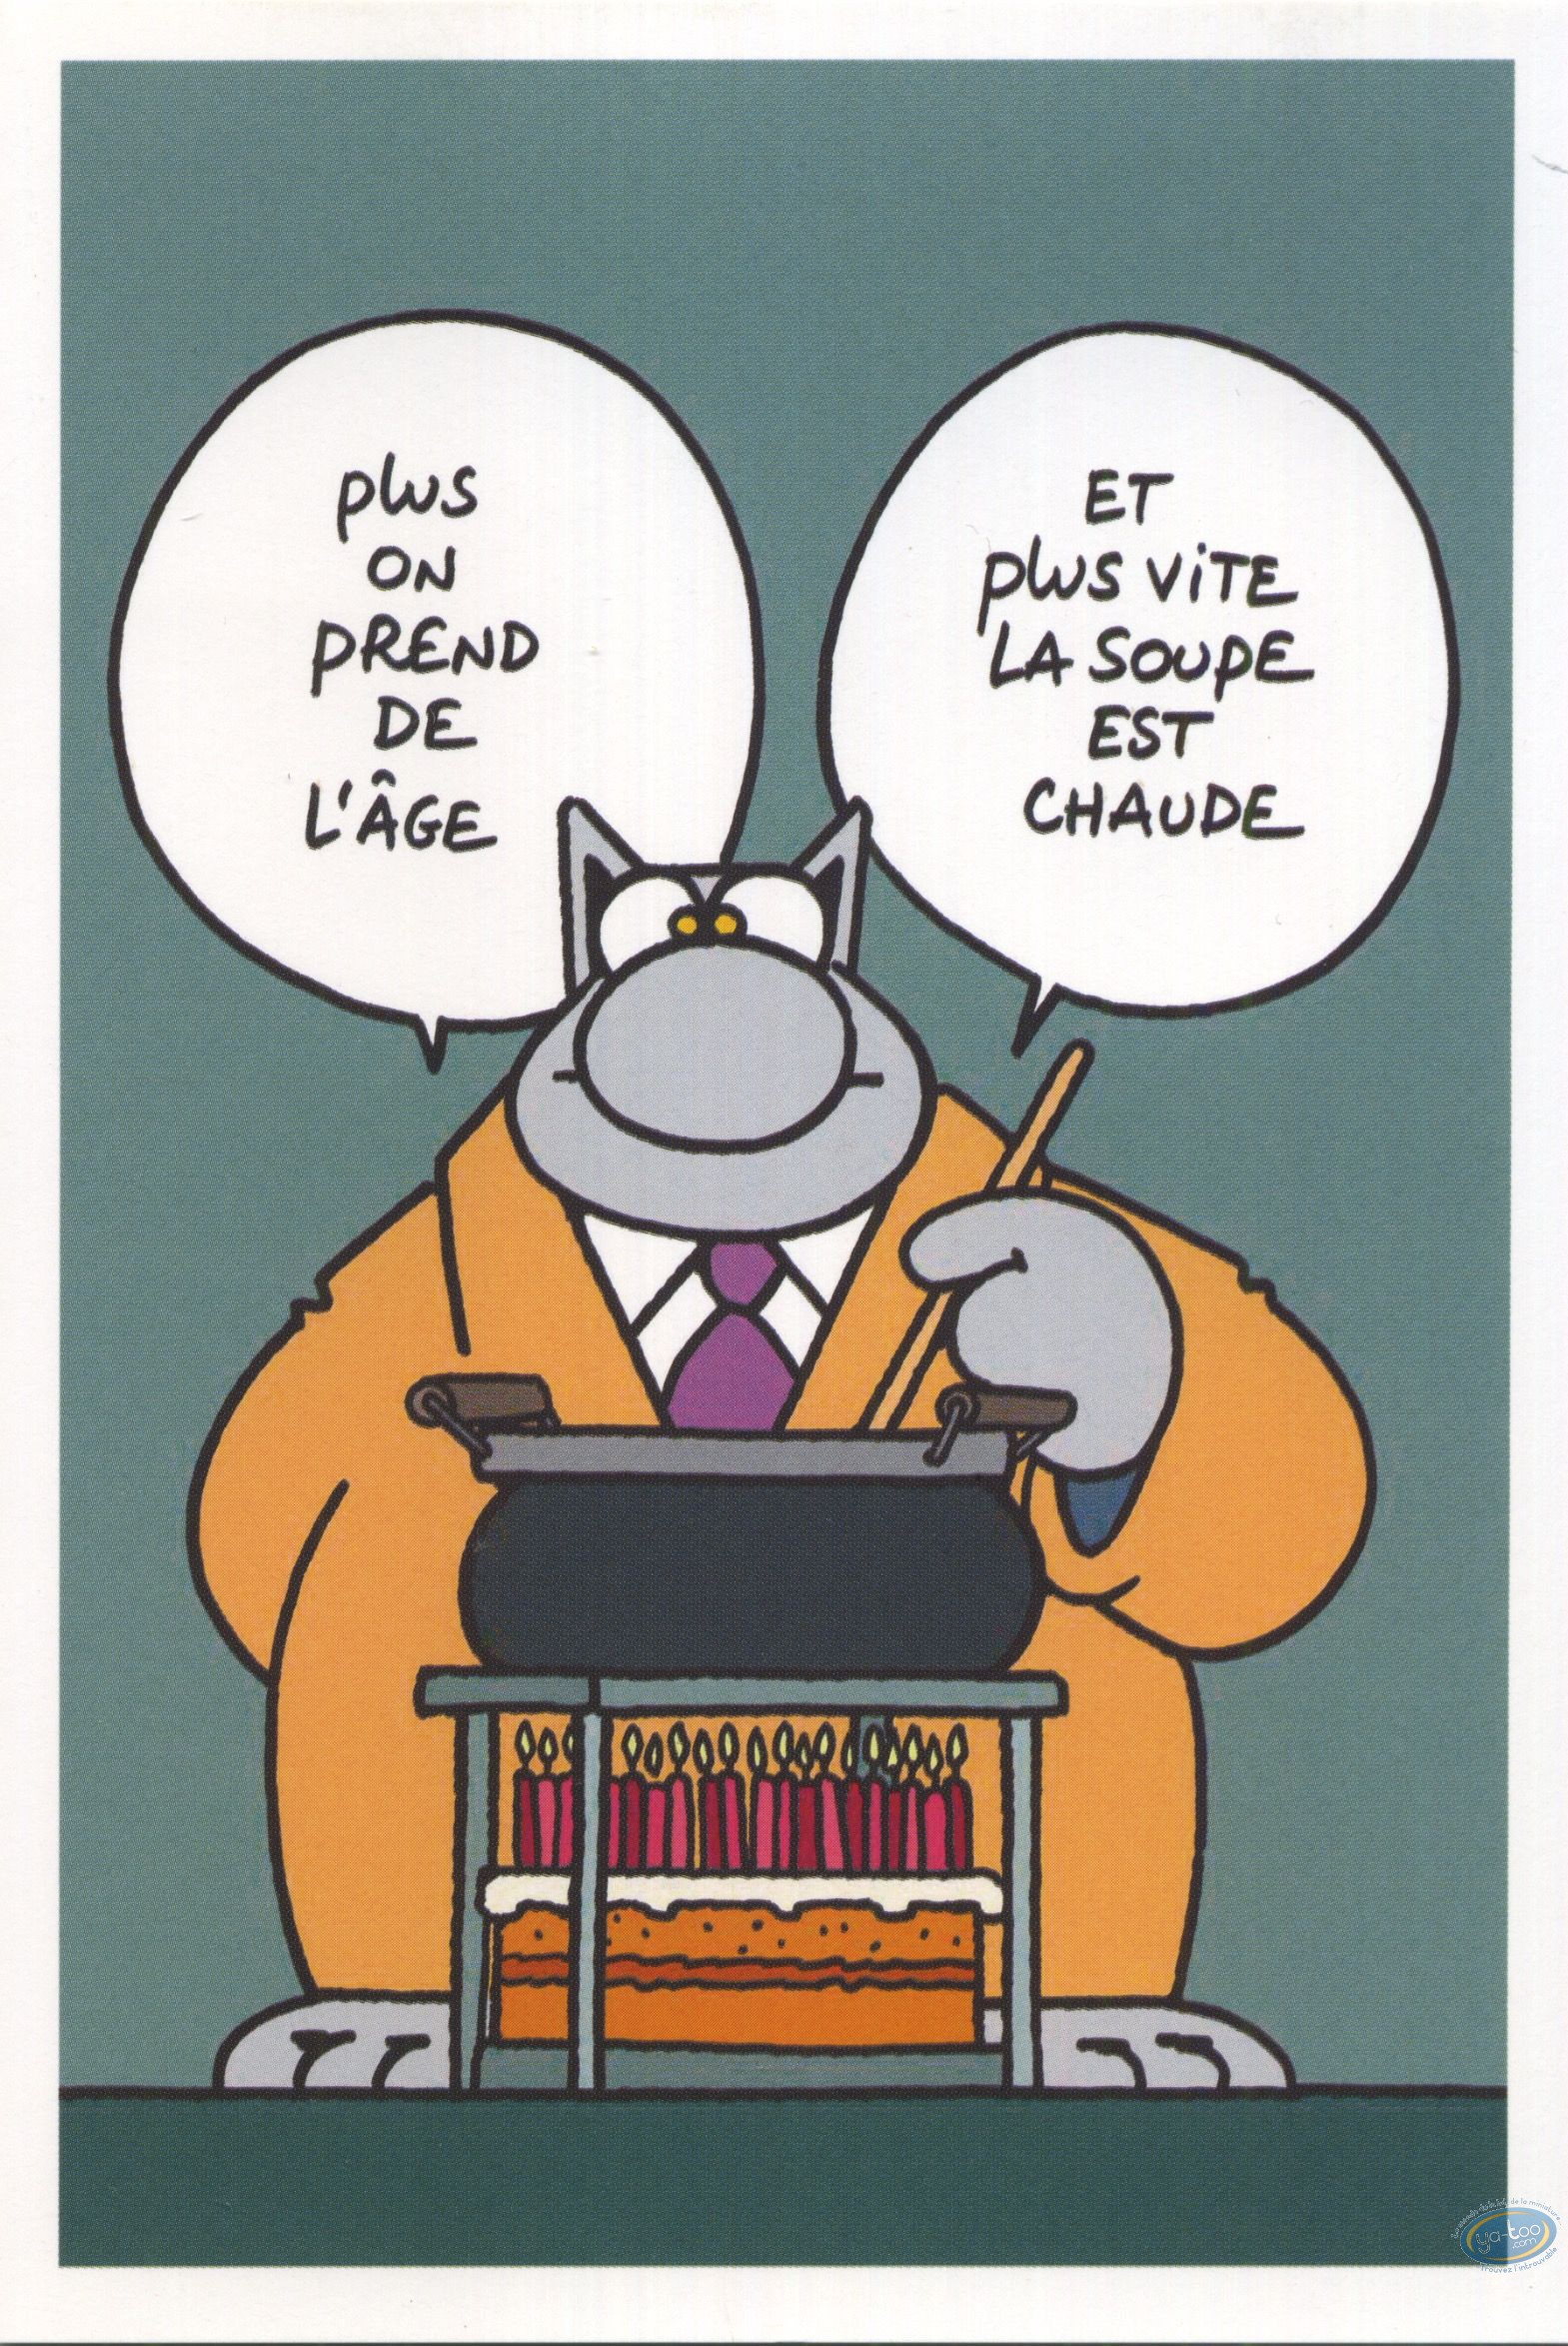 humour - Humour Spirituel (ou presque) - Page 27 Jok-cpchatcd66